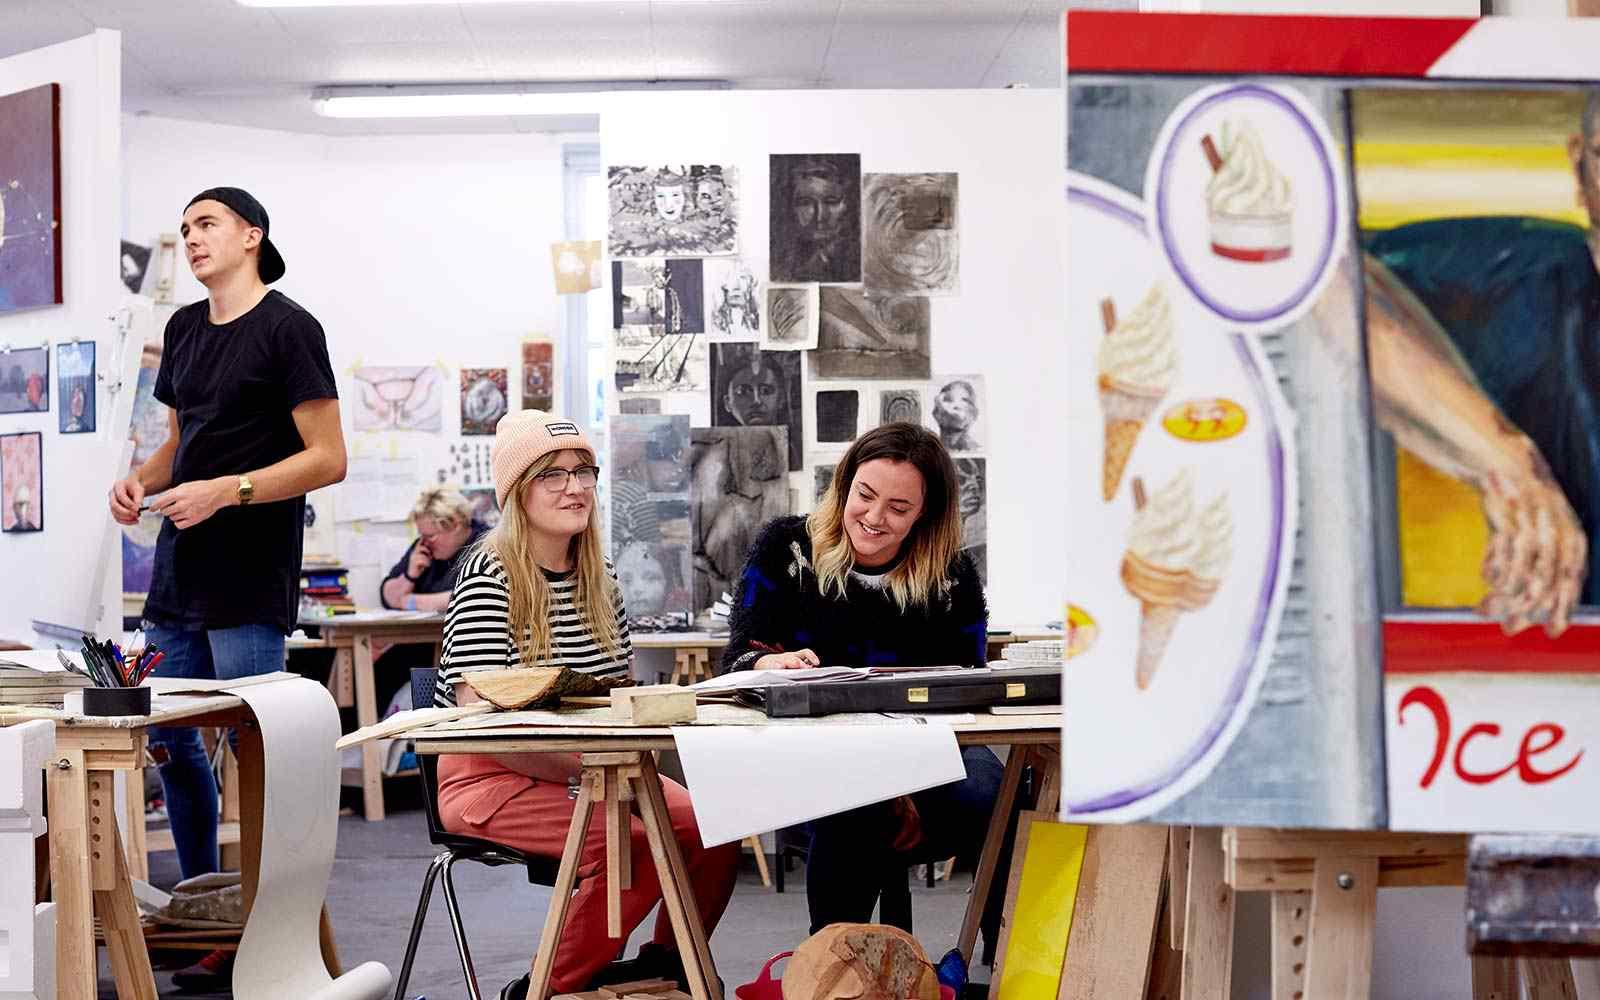 Art and design students working in design studio